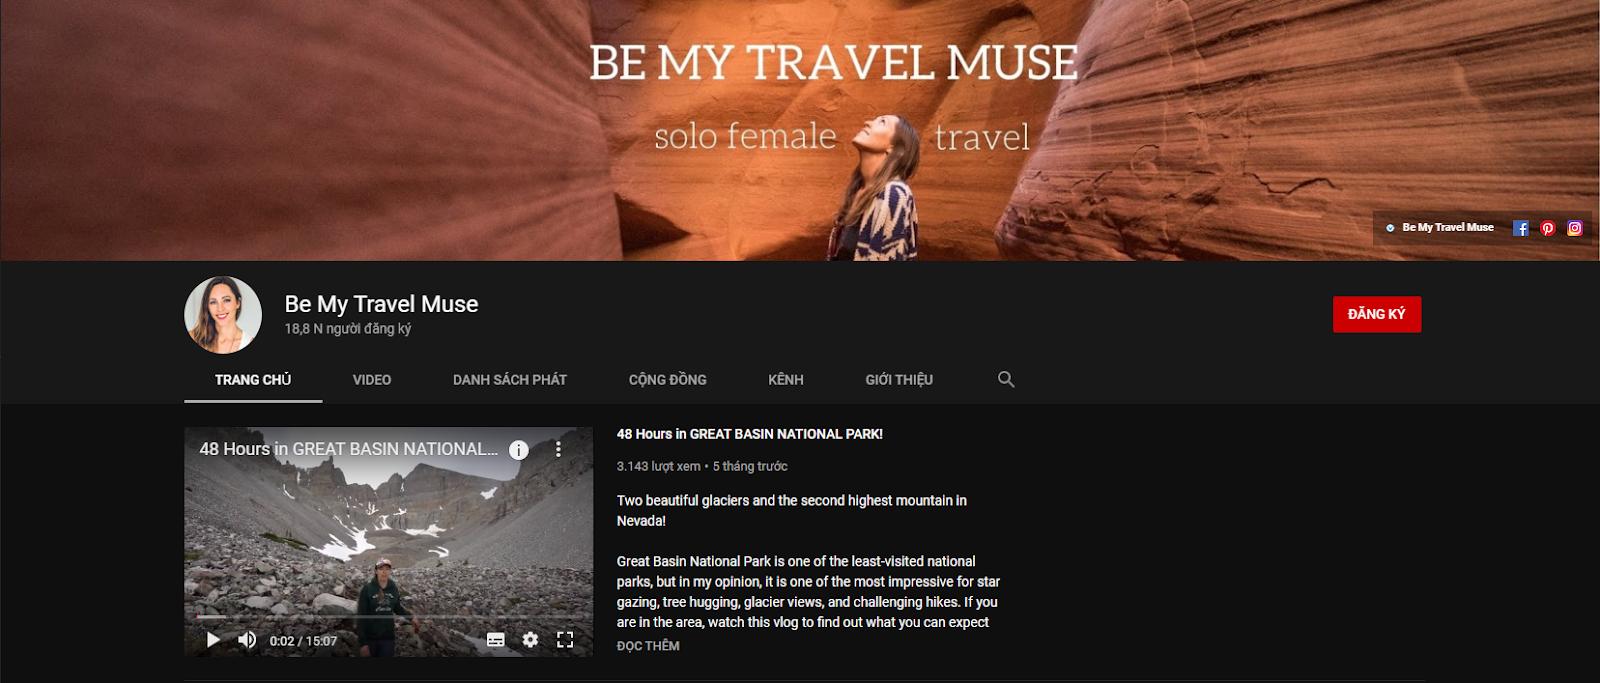 8 Best Ways to Get 1000 Youtube Subscribers